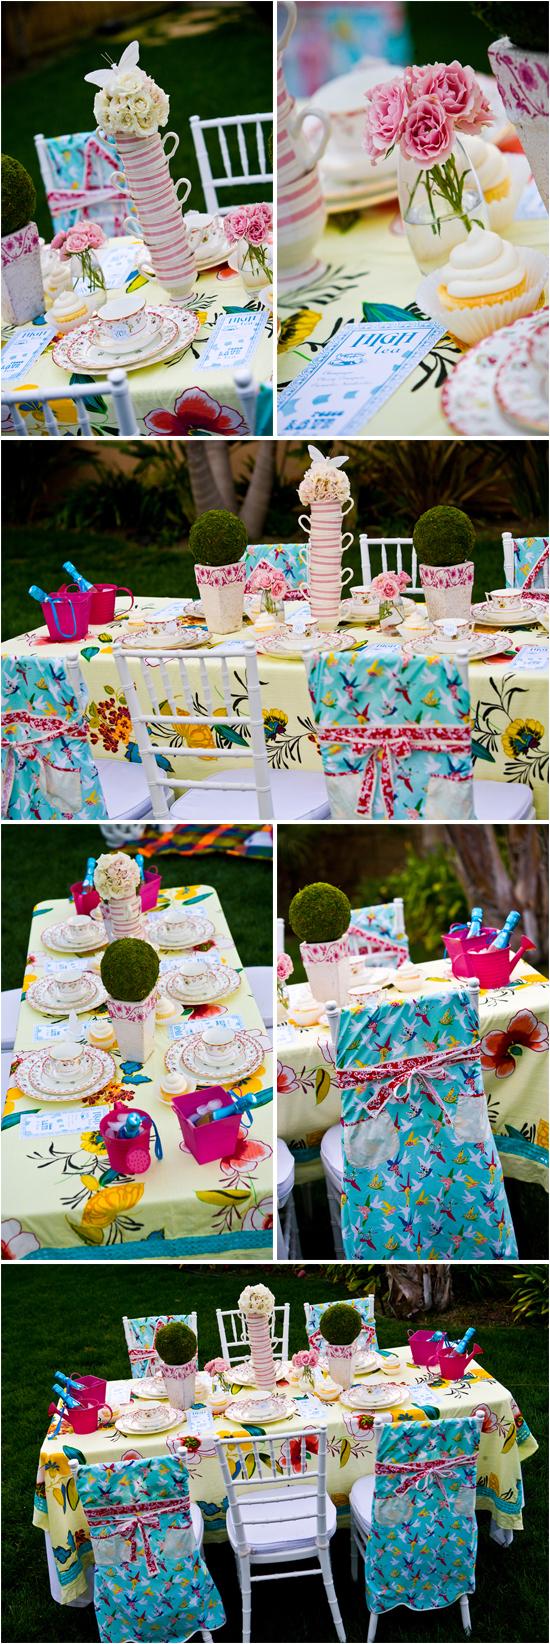 Diy decor alice in wonderland project wedding for Decorating ideas alice in wonderland themed party